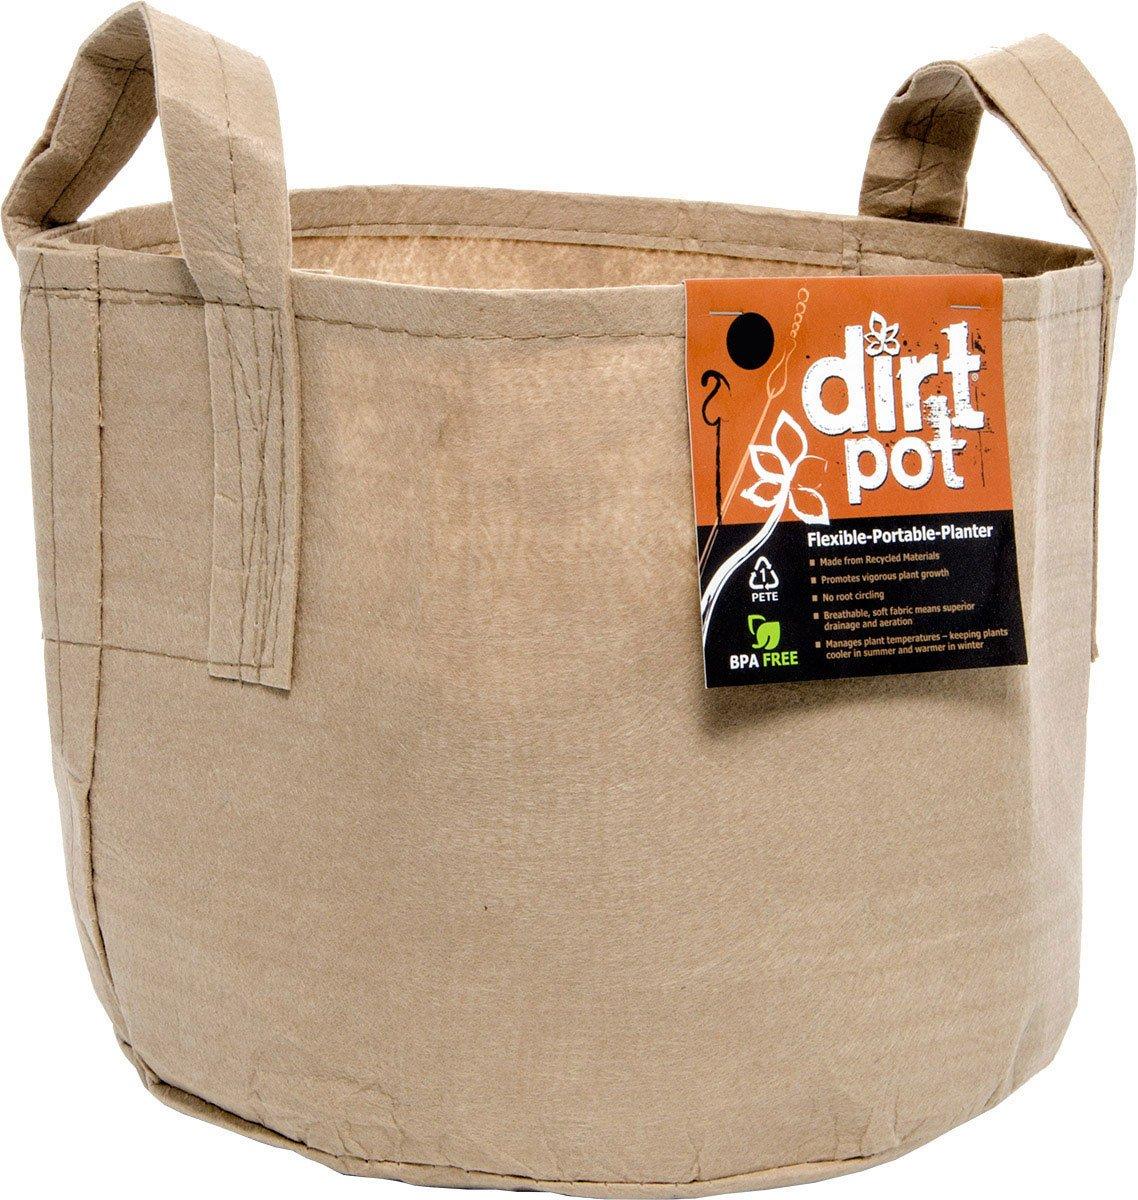 Dirt Pot HGDBT600H  Flexible Portable Planter, Tan, 600 gallon by Hydrofarm